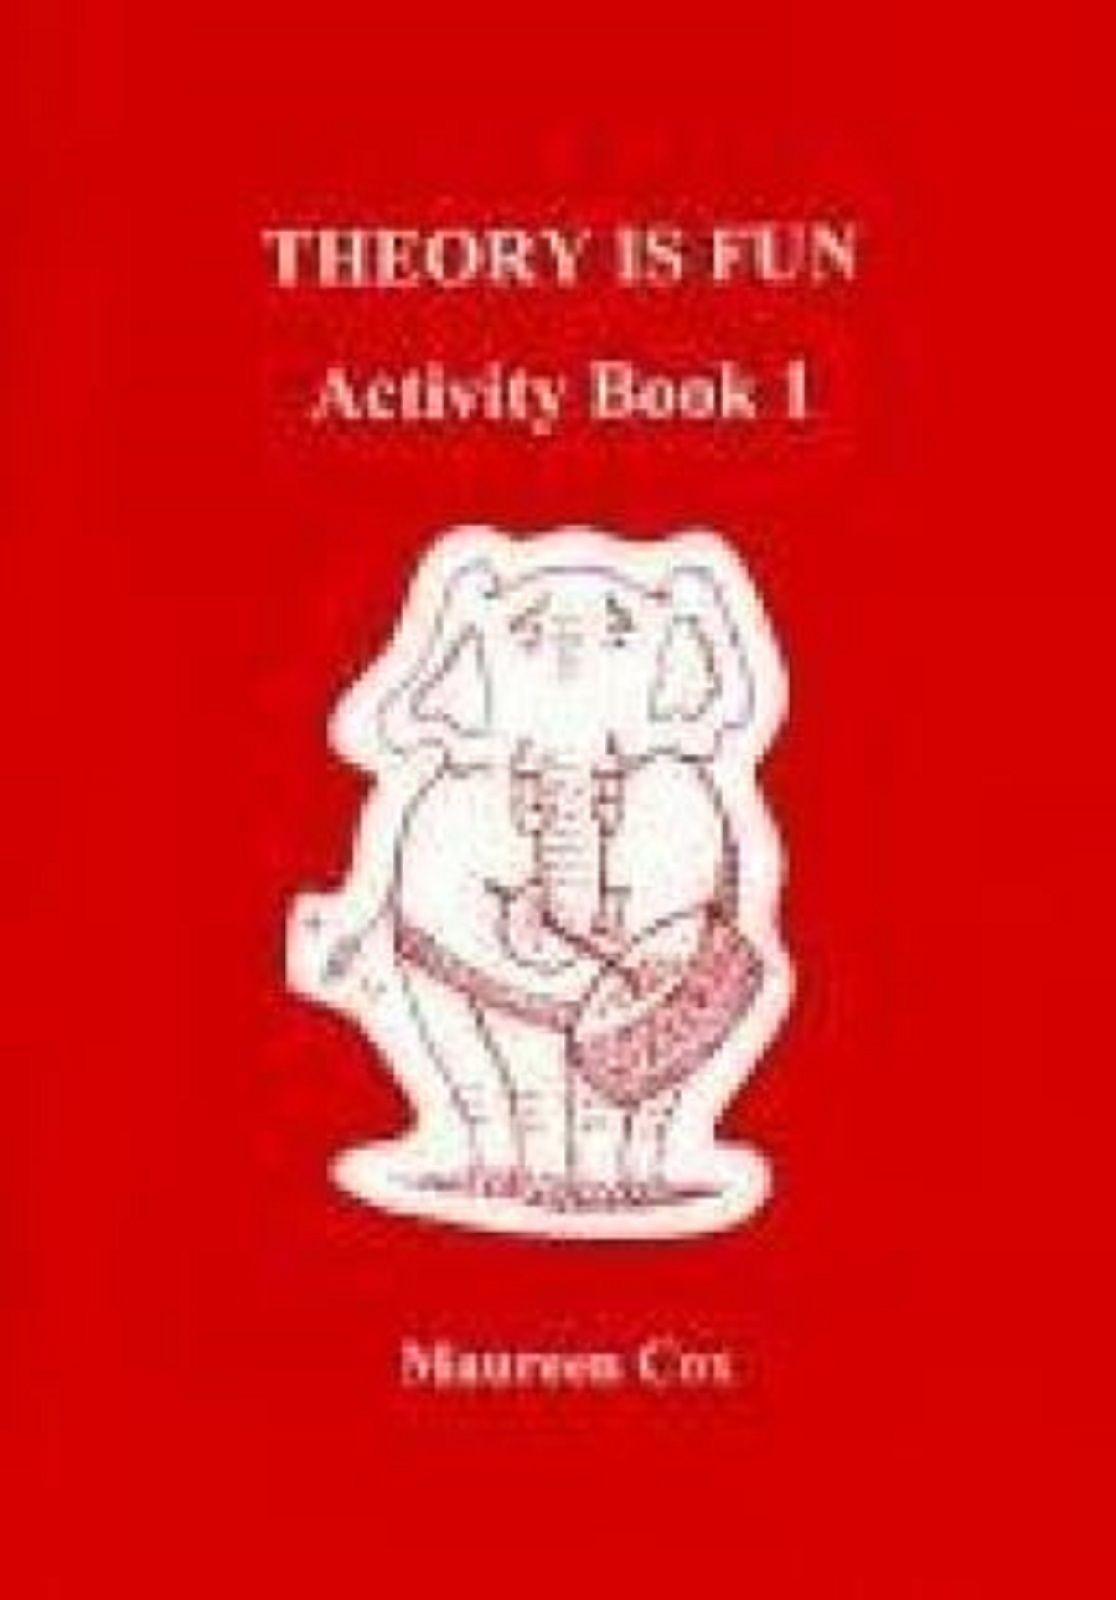 Theory Is Fun Activity Book 1 Maureen Learn Method Cox S134